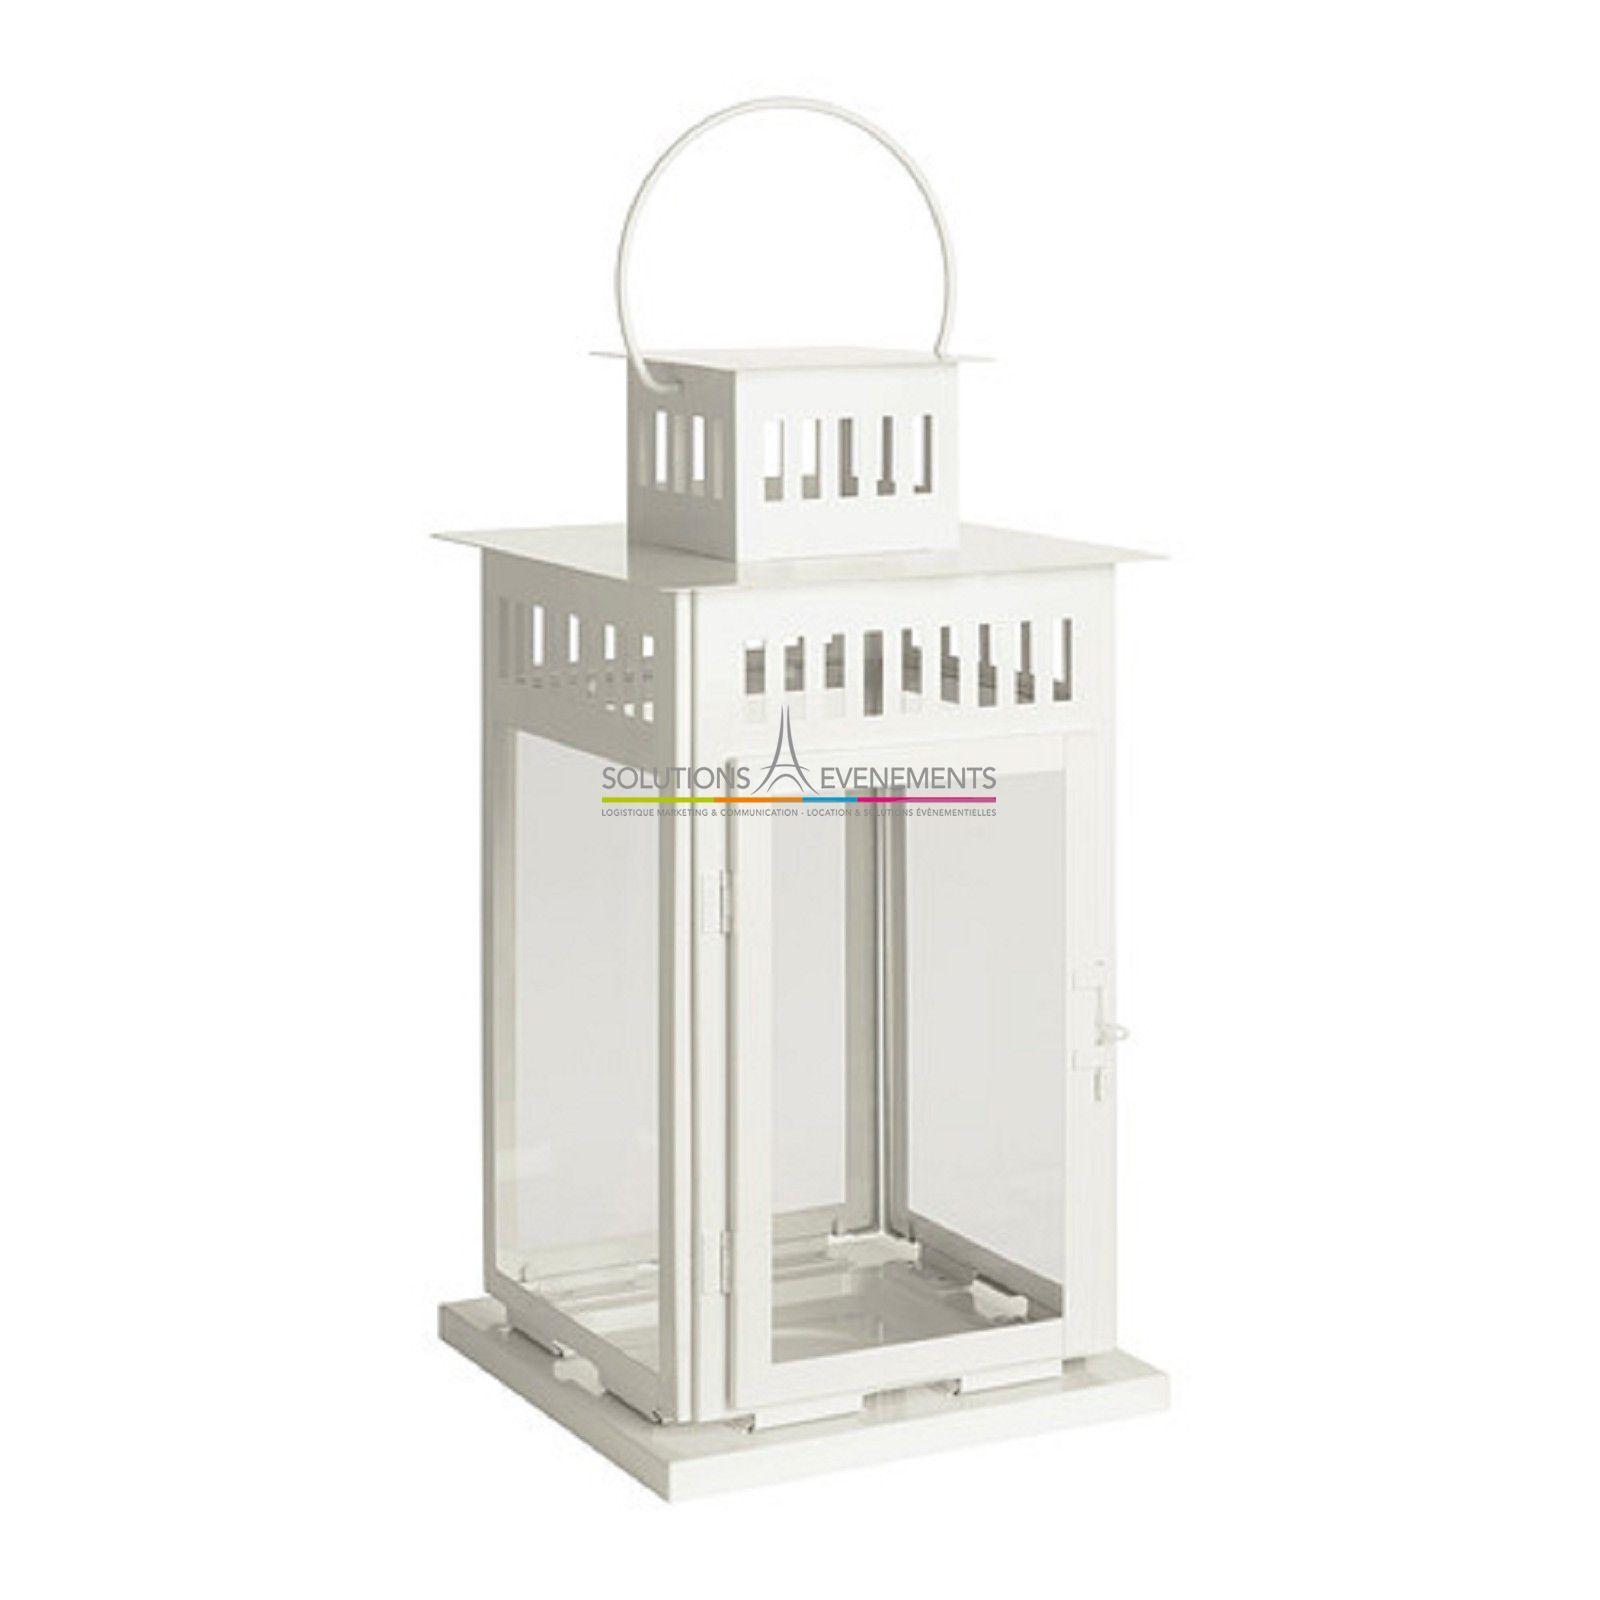 location lanterne et decoration champetre solutions evenements. Black Bedroom Furniture Sets. Home Design Ideas